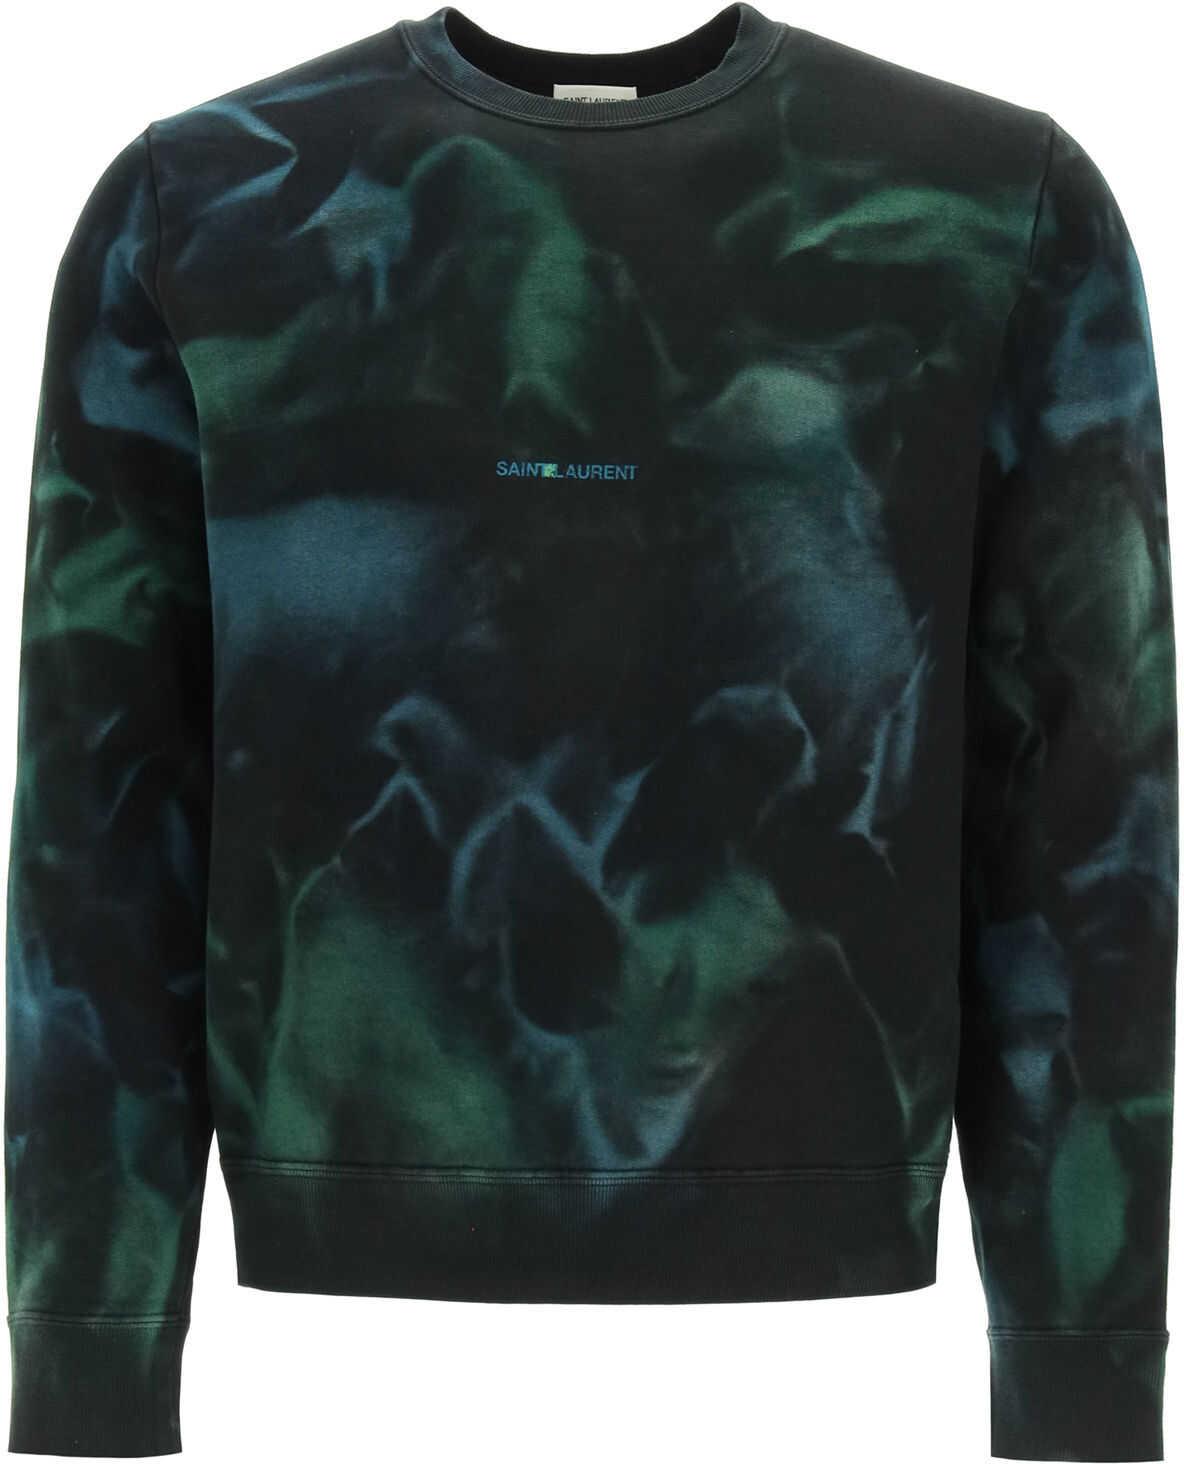 Saint Laurent Tie-Dye Sweatshirt With Logo Print BLACK GREEN imagine